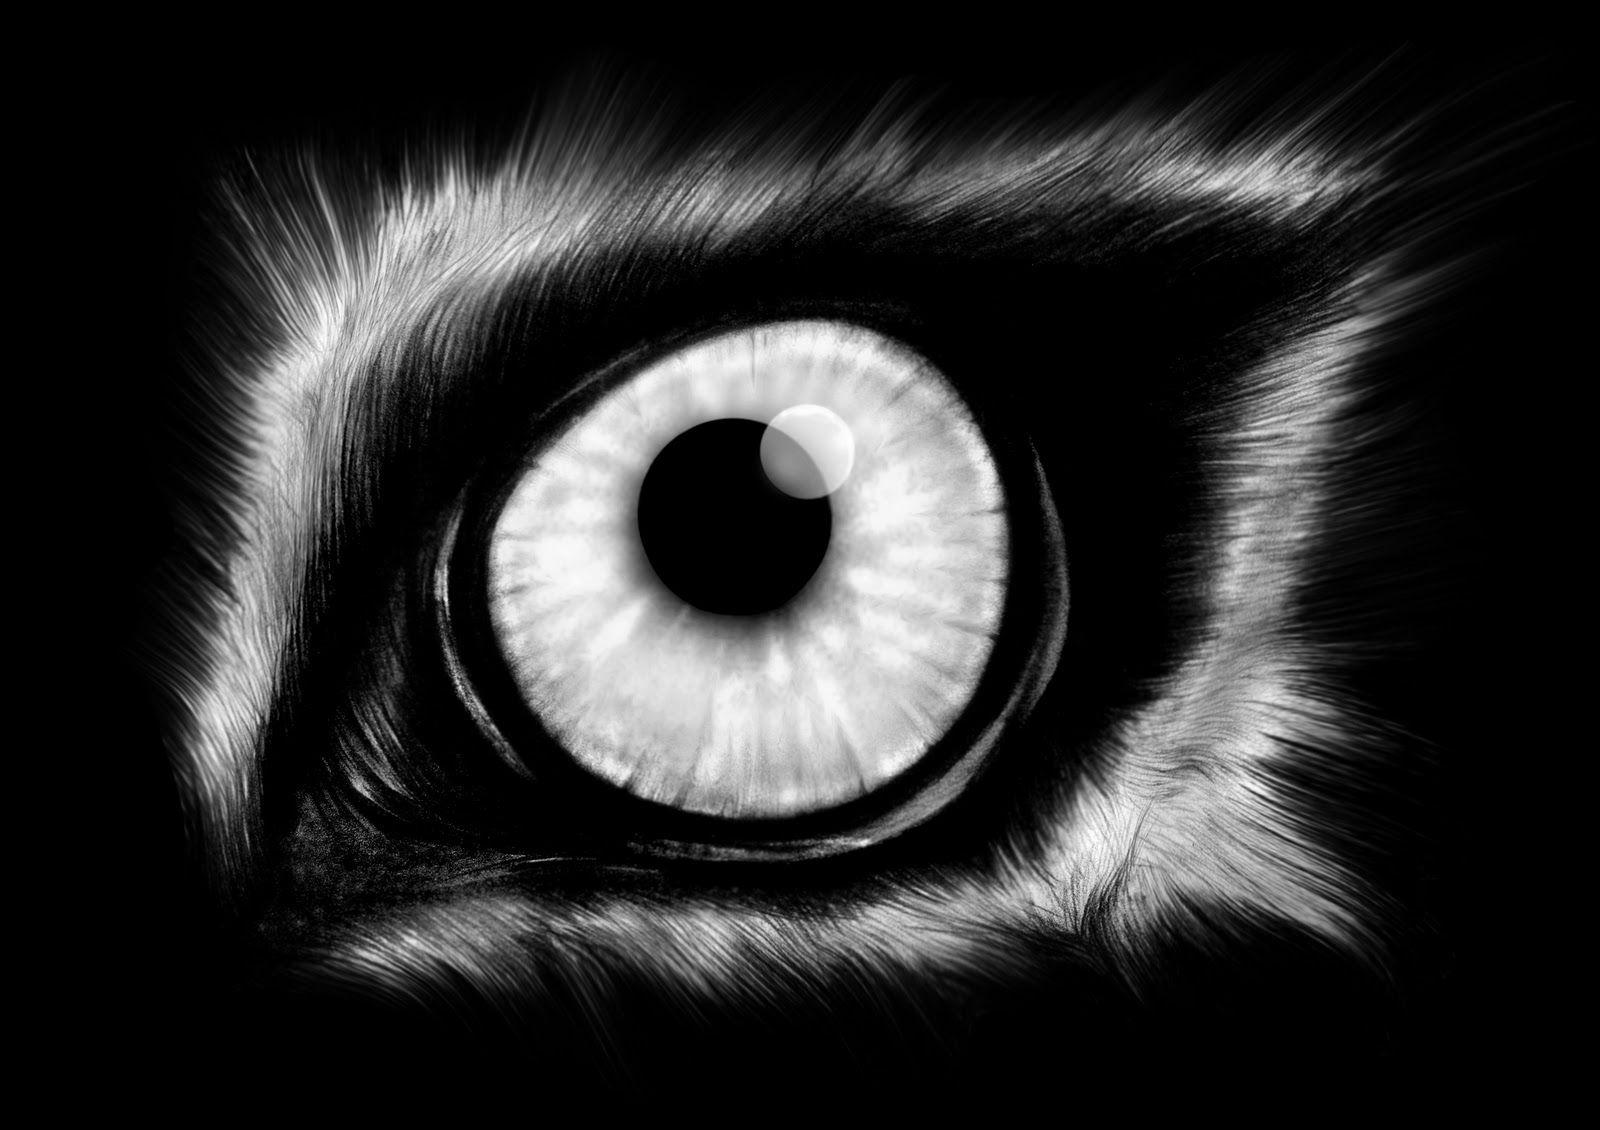 wolf head illustration - Google Search